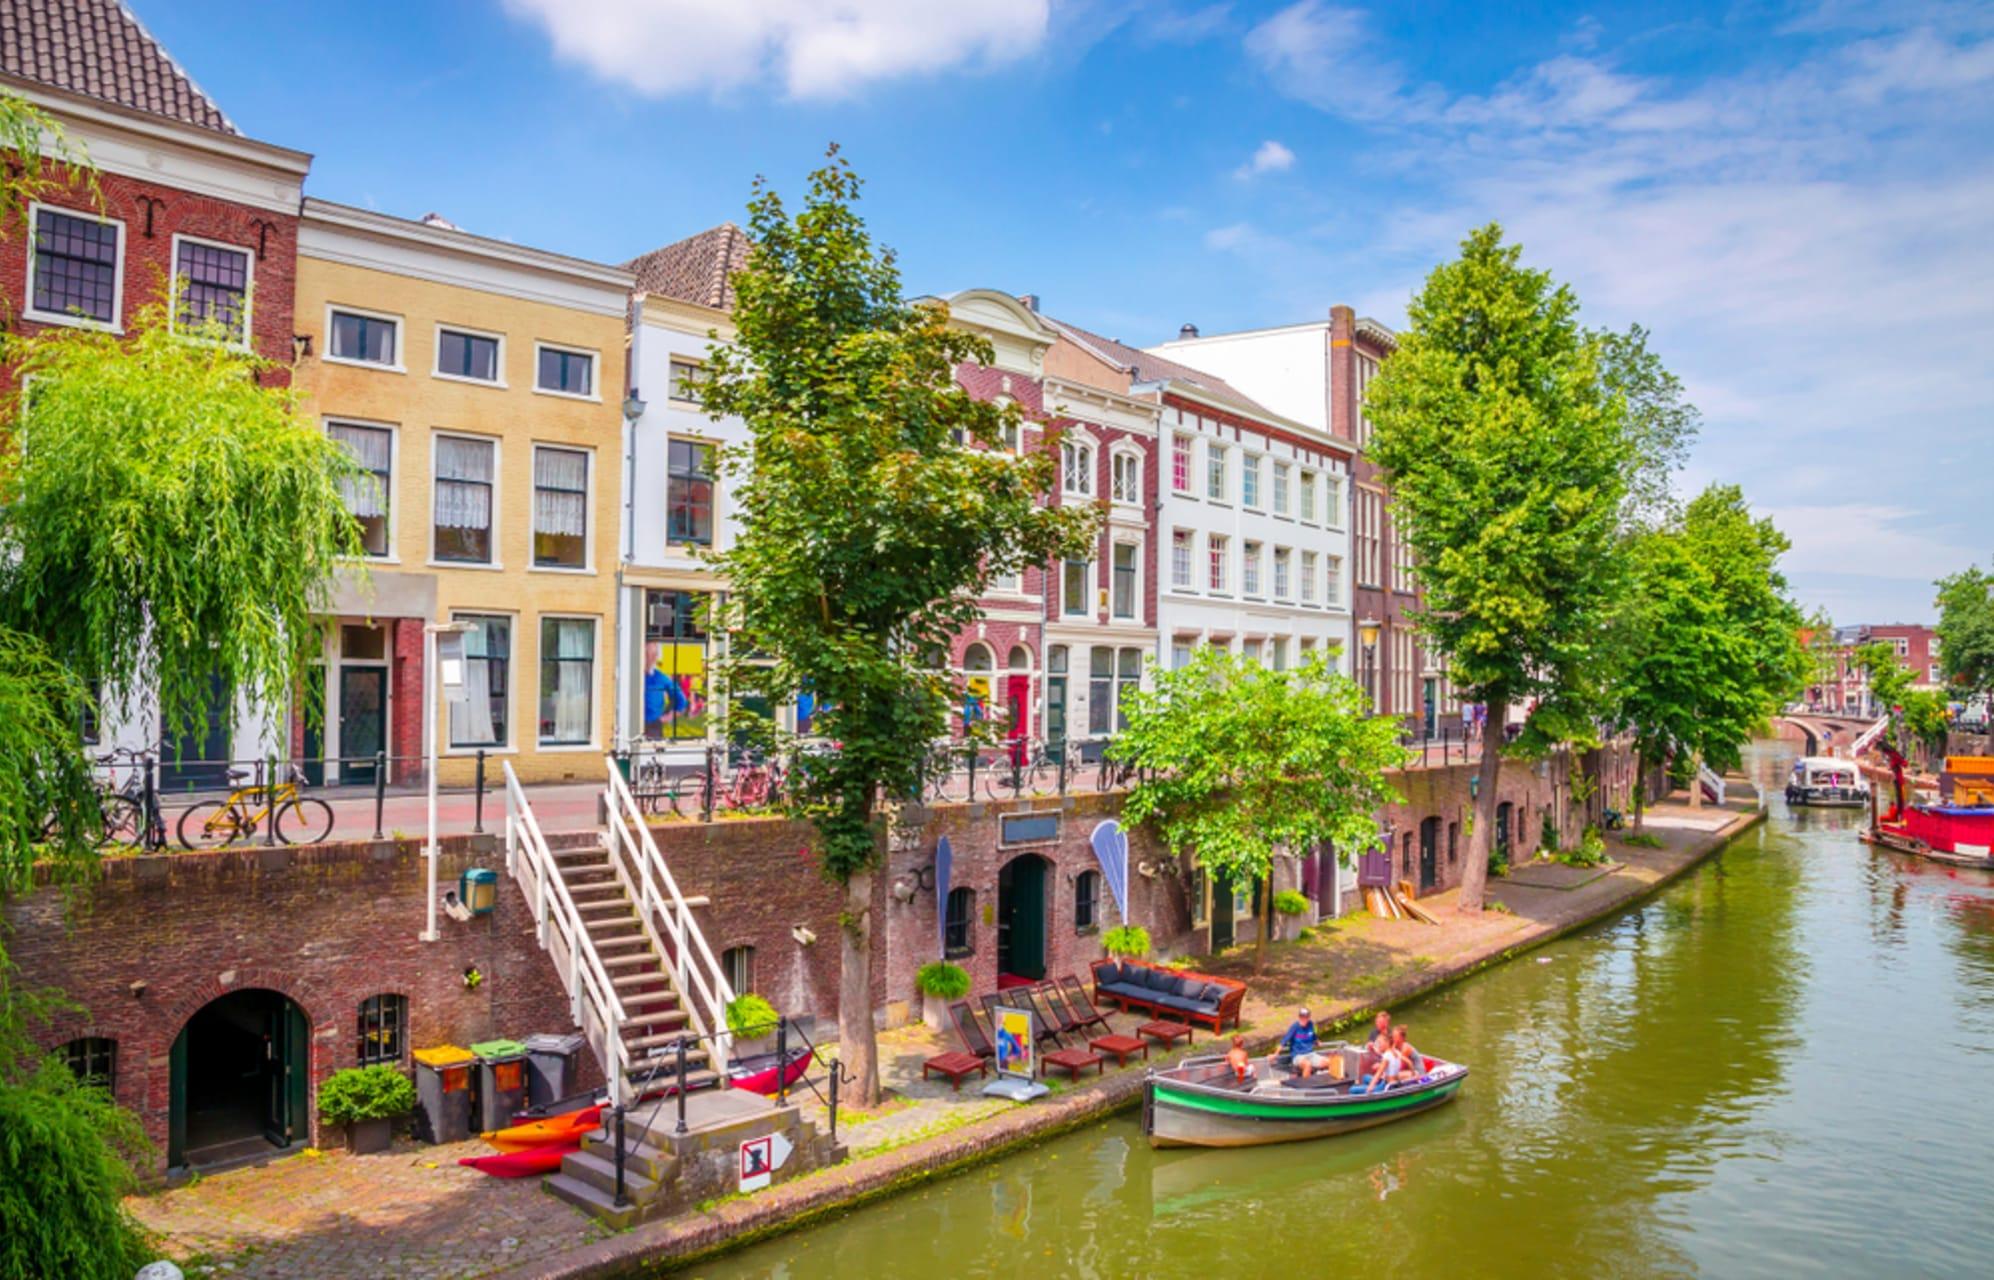 Utrecht cover image